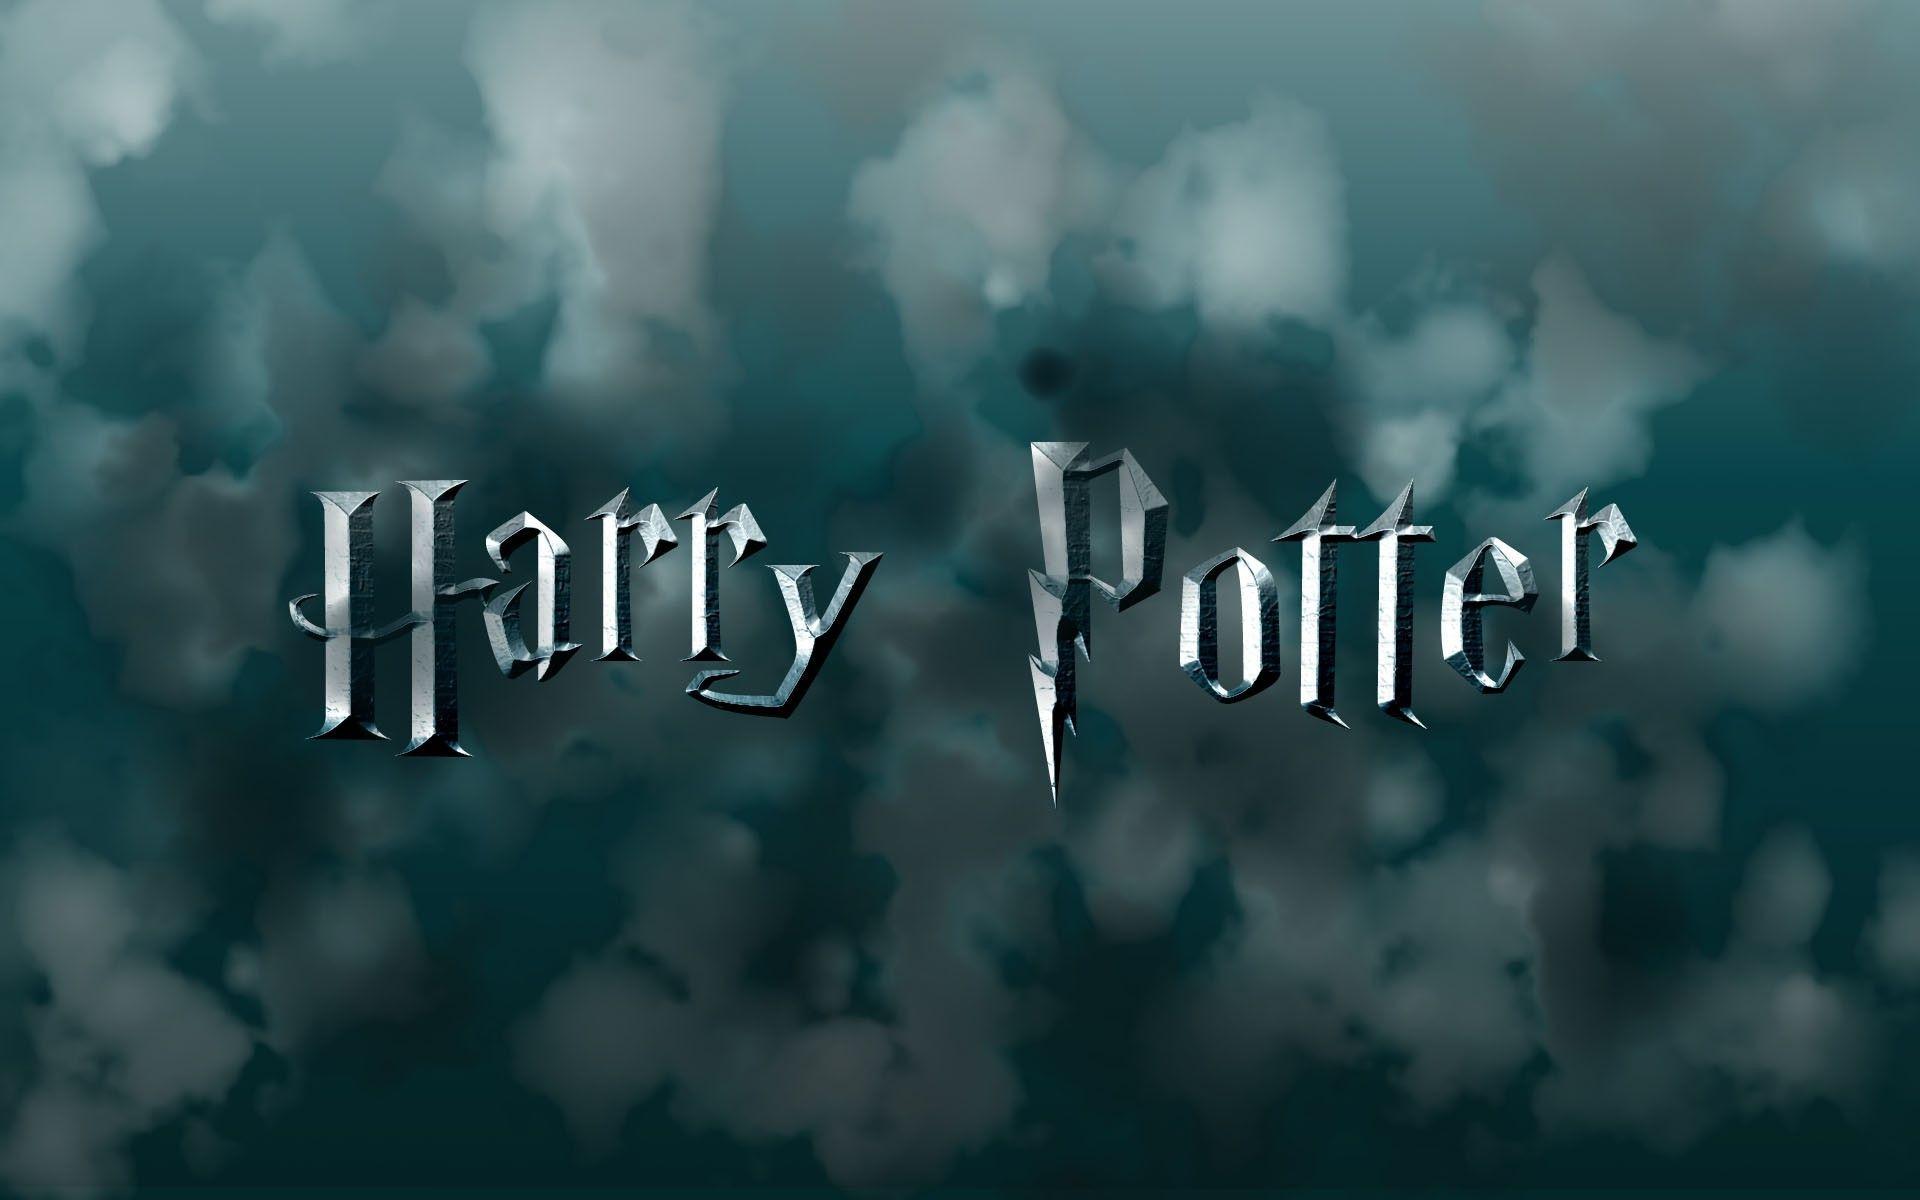 Fondos De Pantalla De Harry Potter Fondosmil